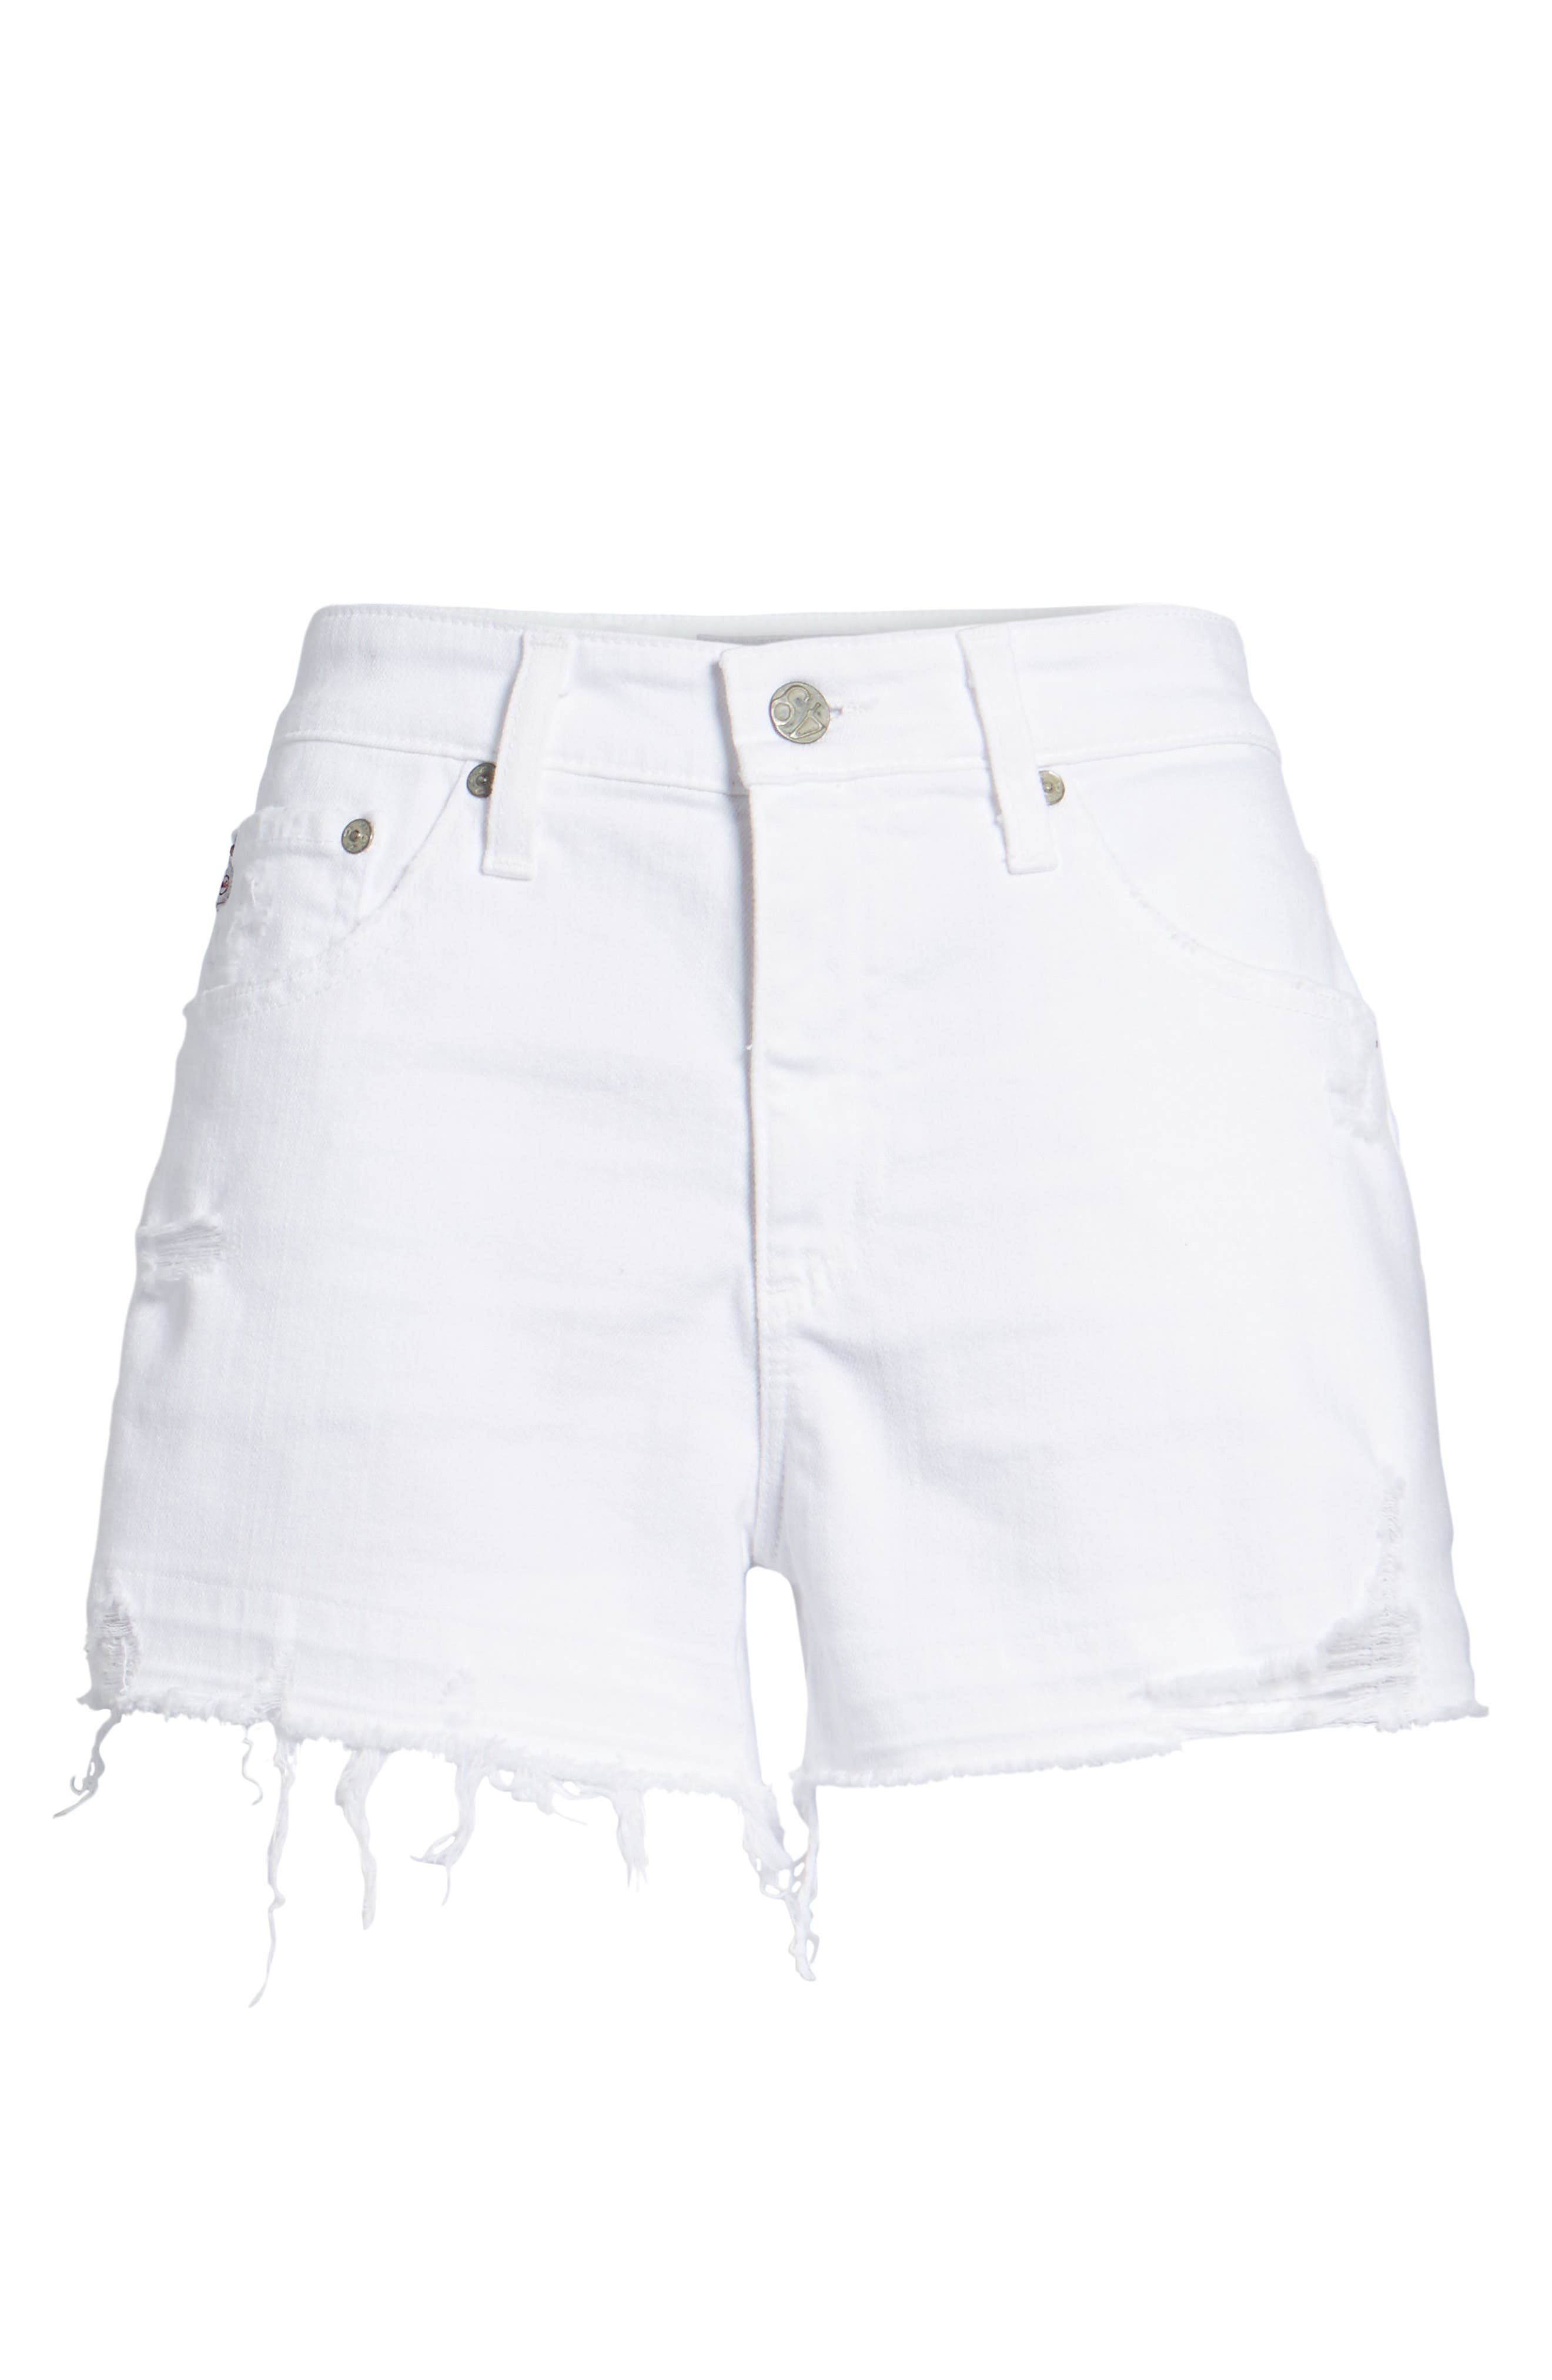 Bryn High Rise Cutoff Denim Shorts,                             Alternate thumbnail 6, color,                             158